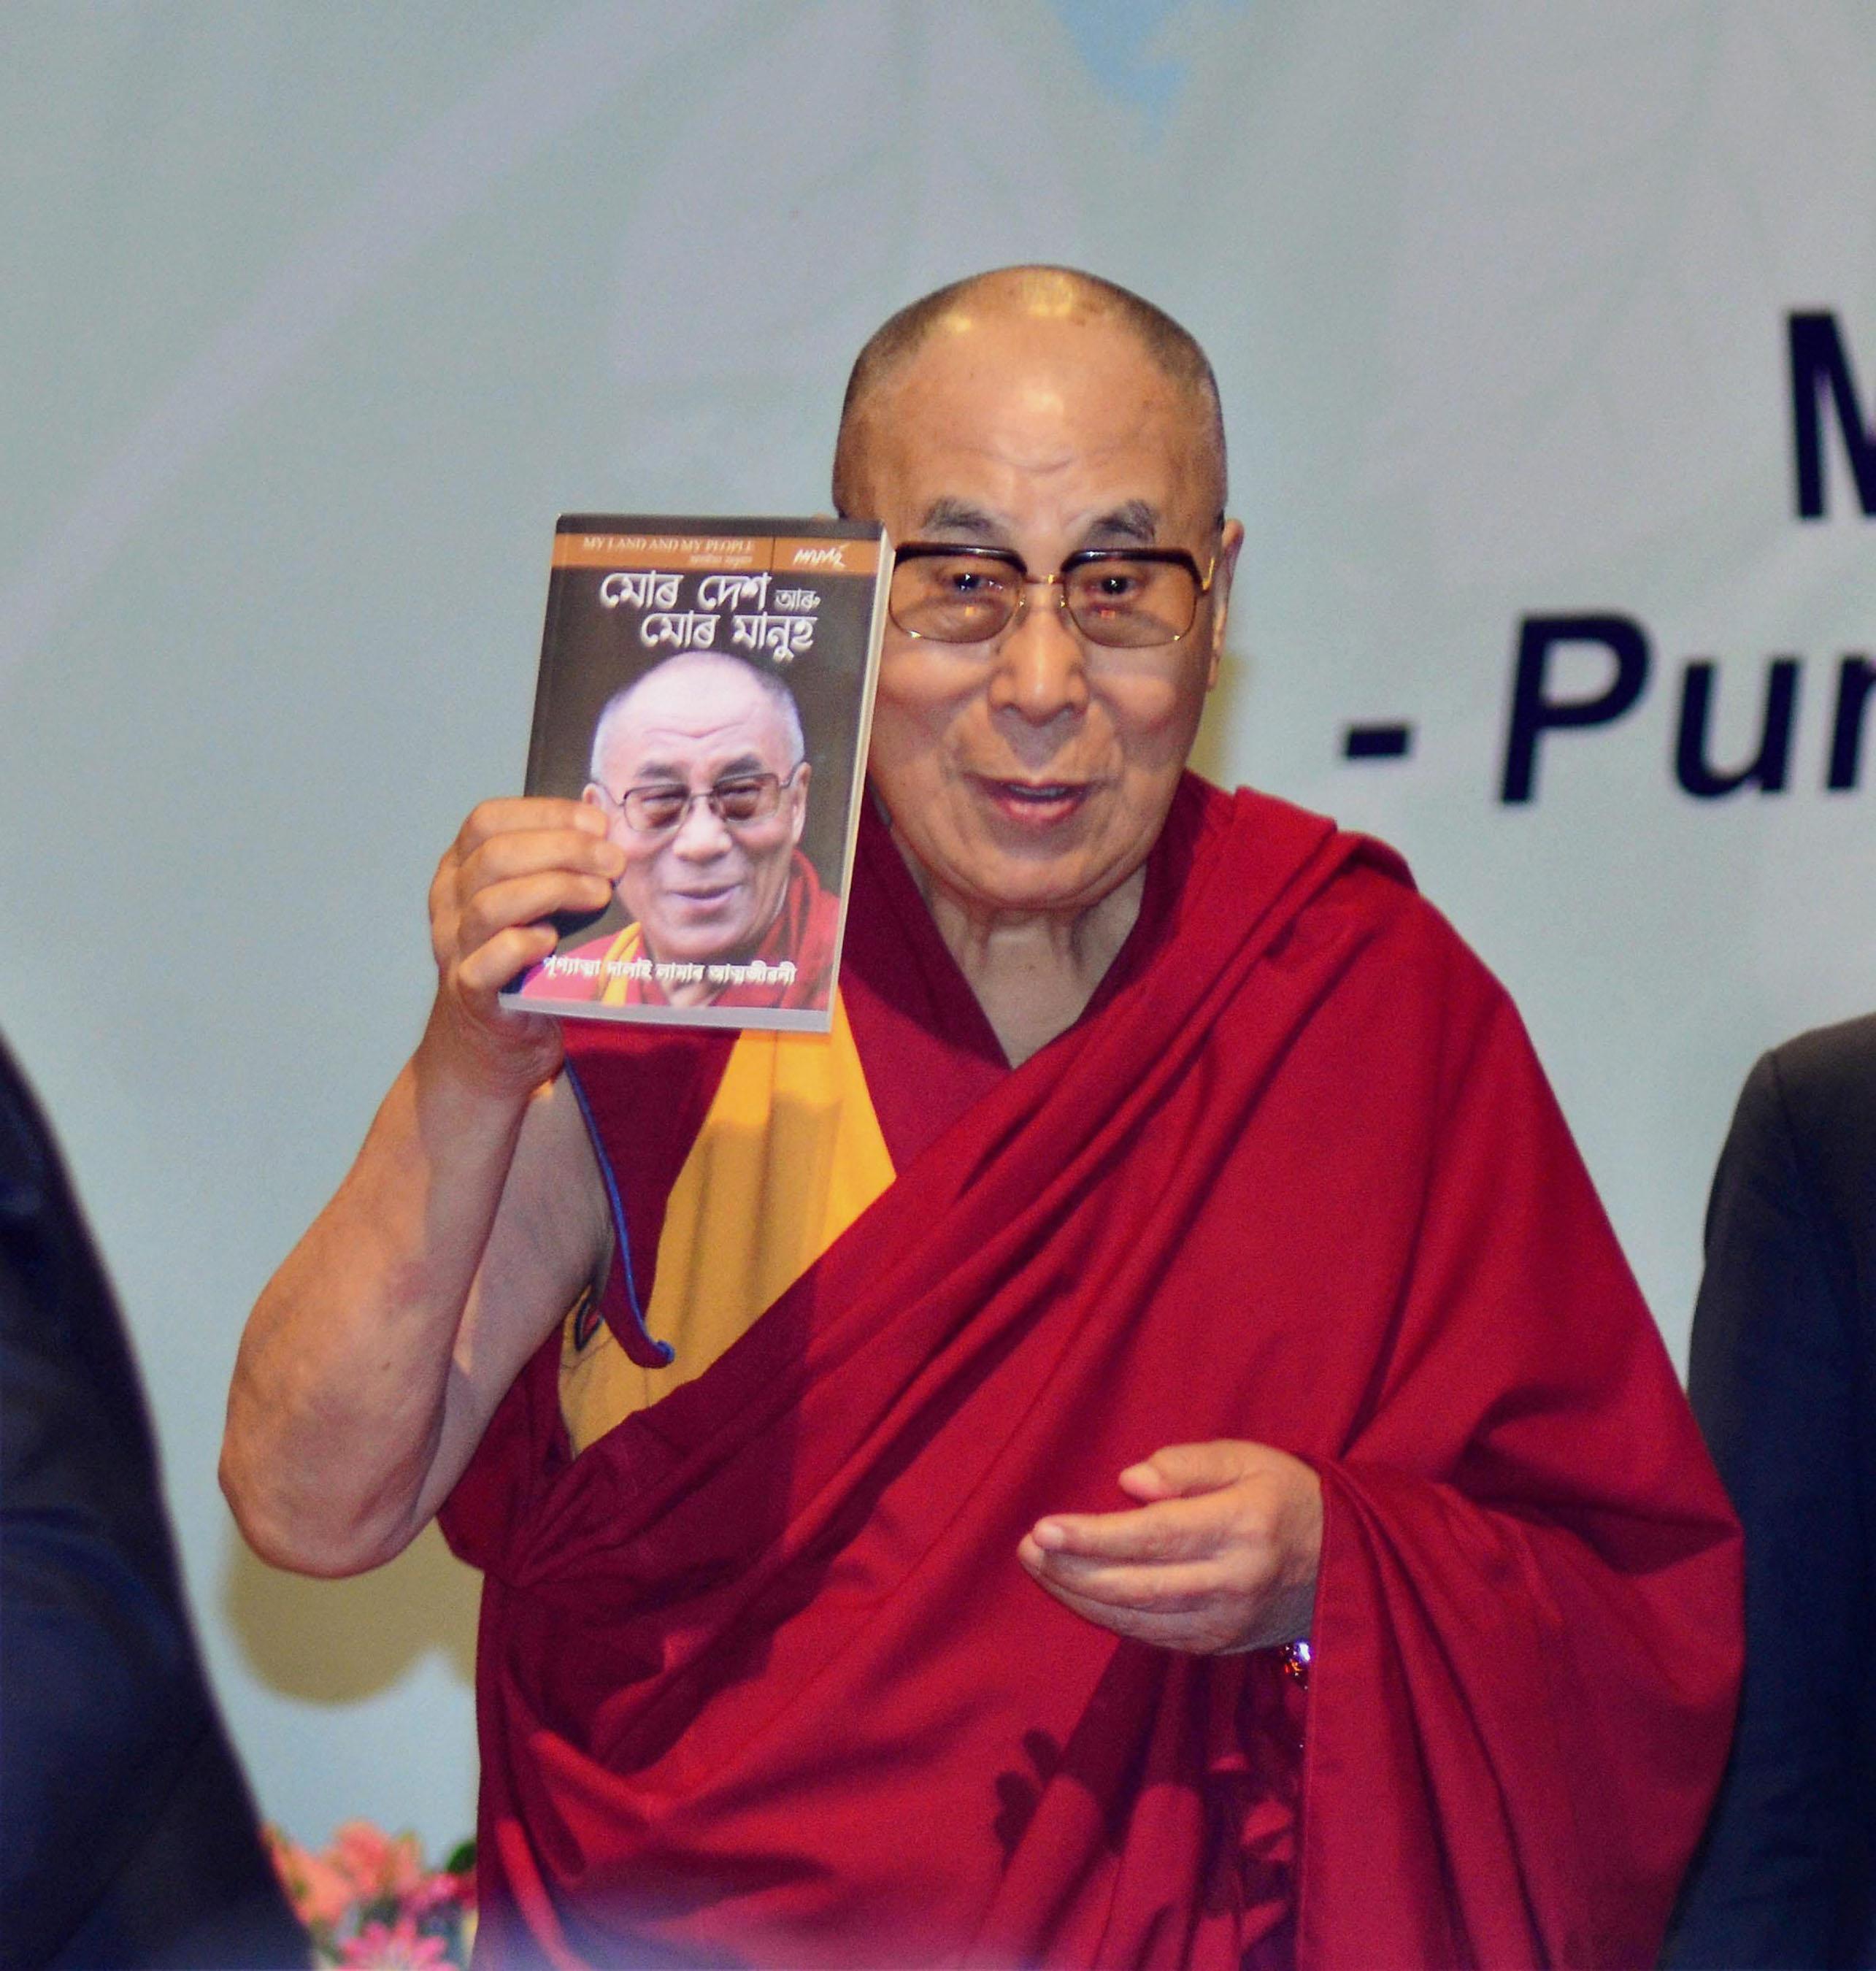 Guwahati: Tibetan spiritual leader Dalai Lama releasing Assamese translation his autobiography 'My Land and My People' as 'Mor Desh aru Mor Manuh' at Guwahati University in Guwahati on Sunday. PTI Photo(PTI4_2_2017_000037B)